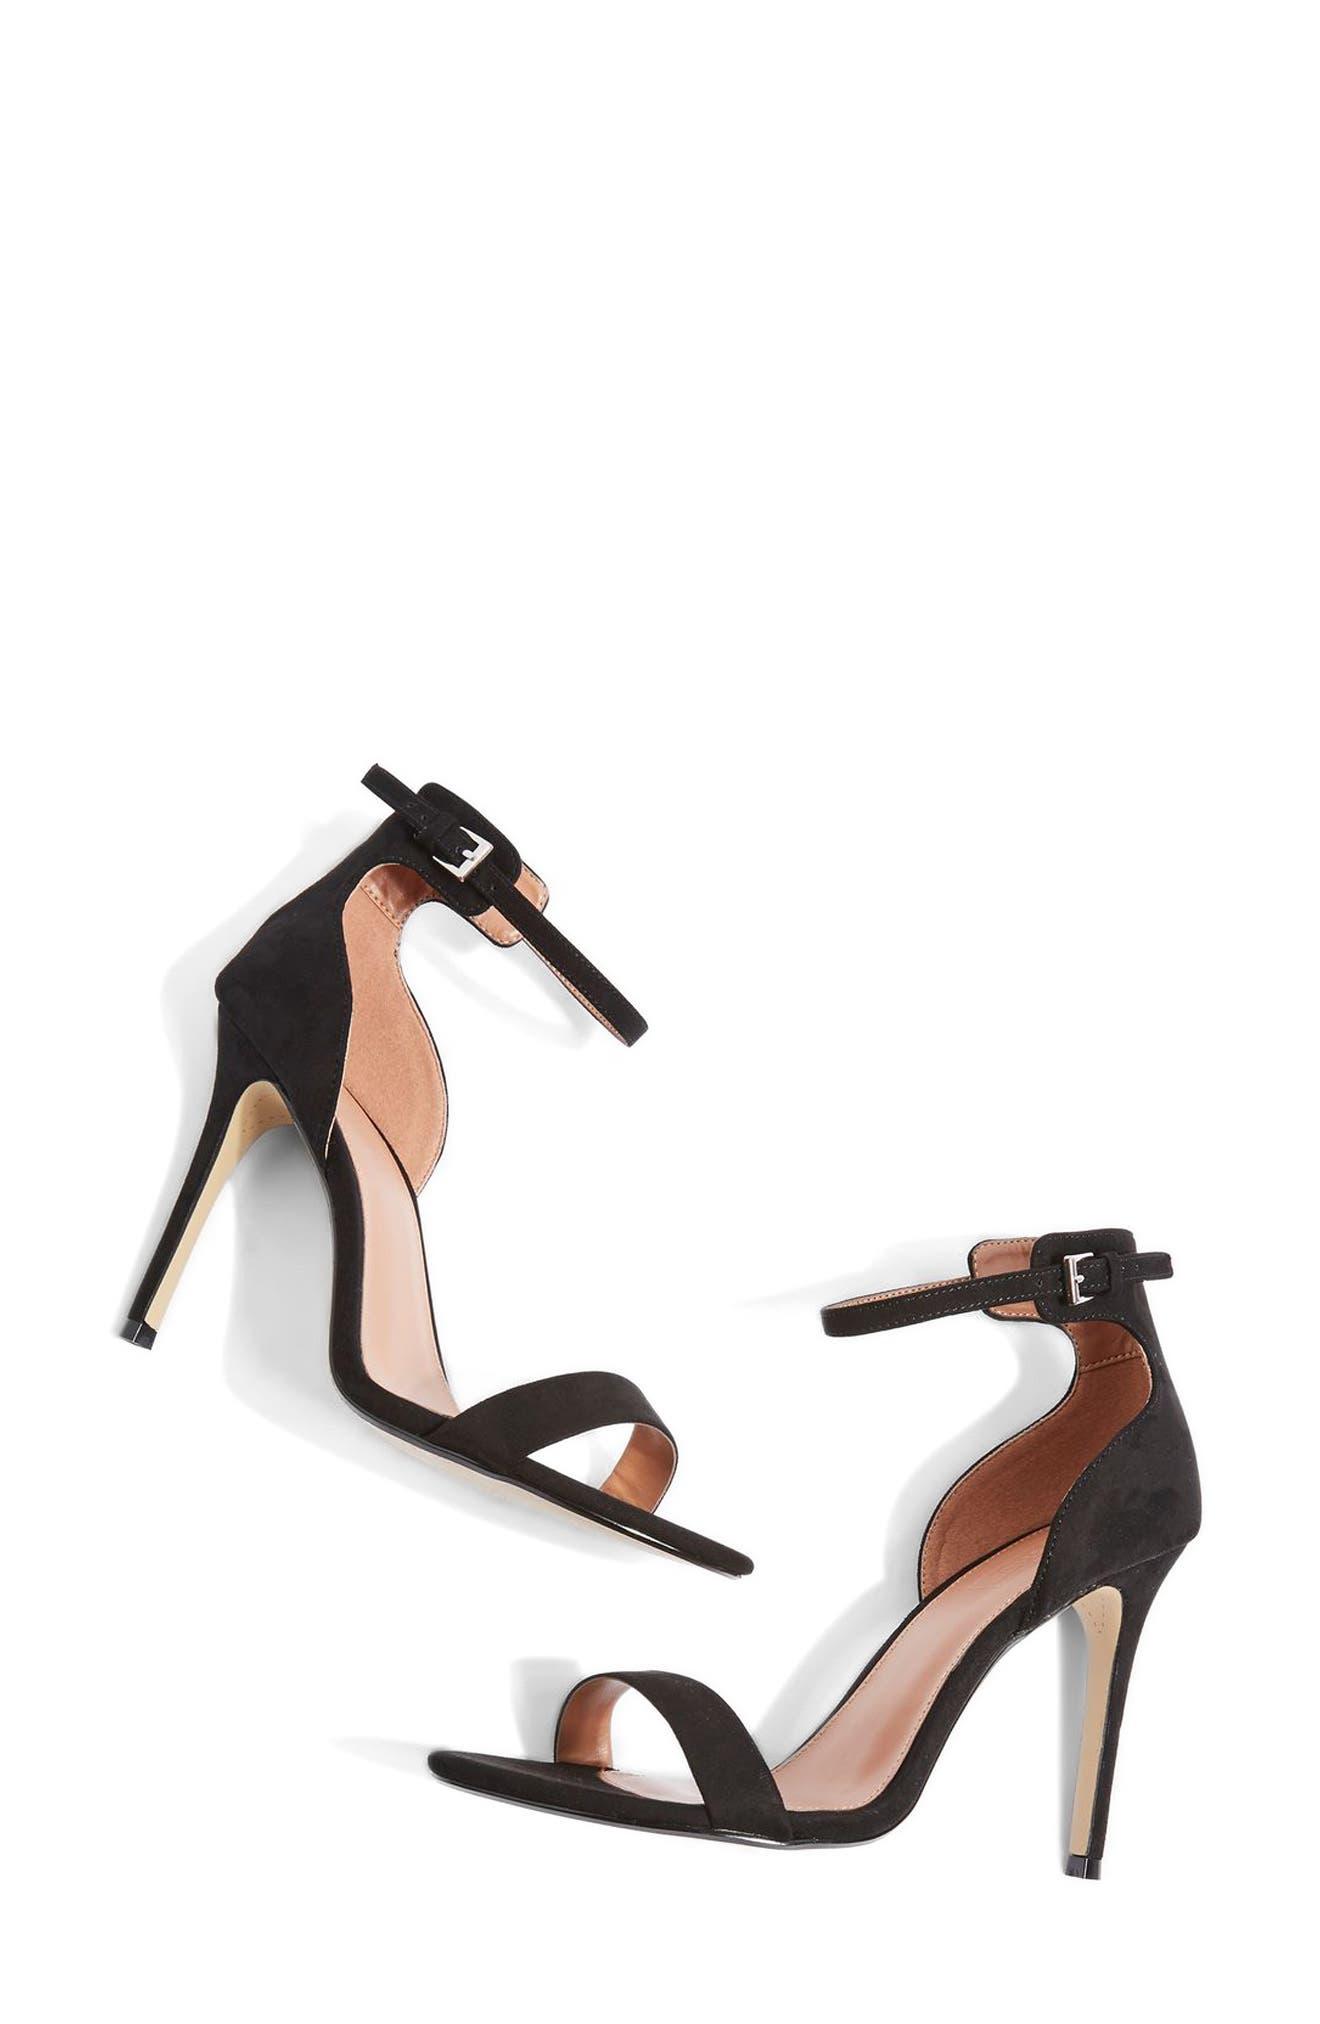 Marcelle Ankle Strap Sandal,                         Main,                         color,